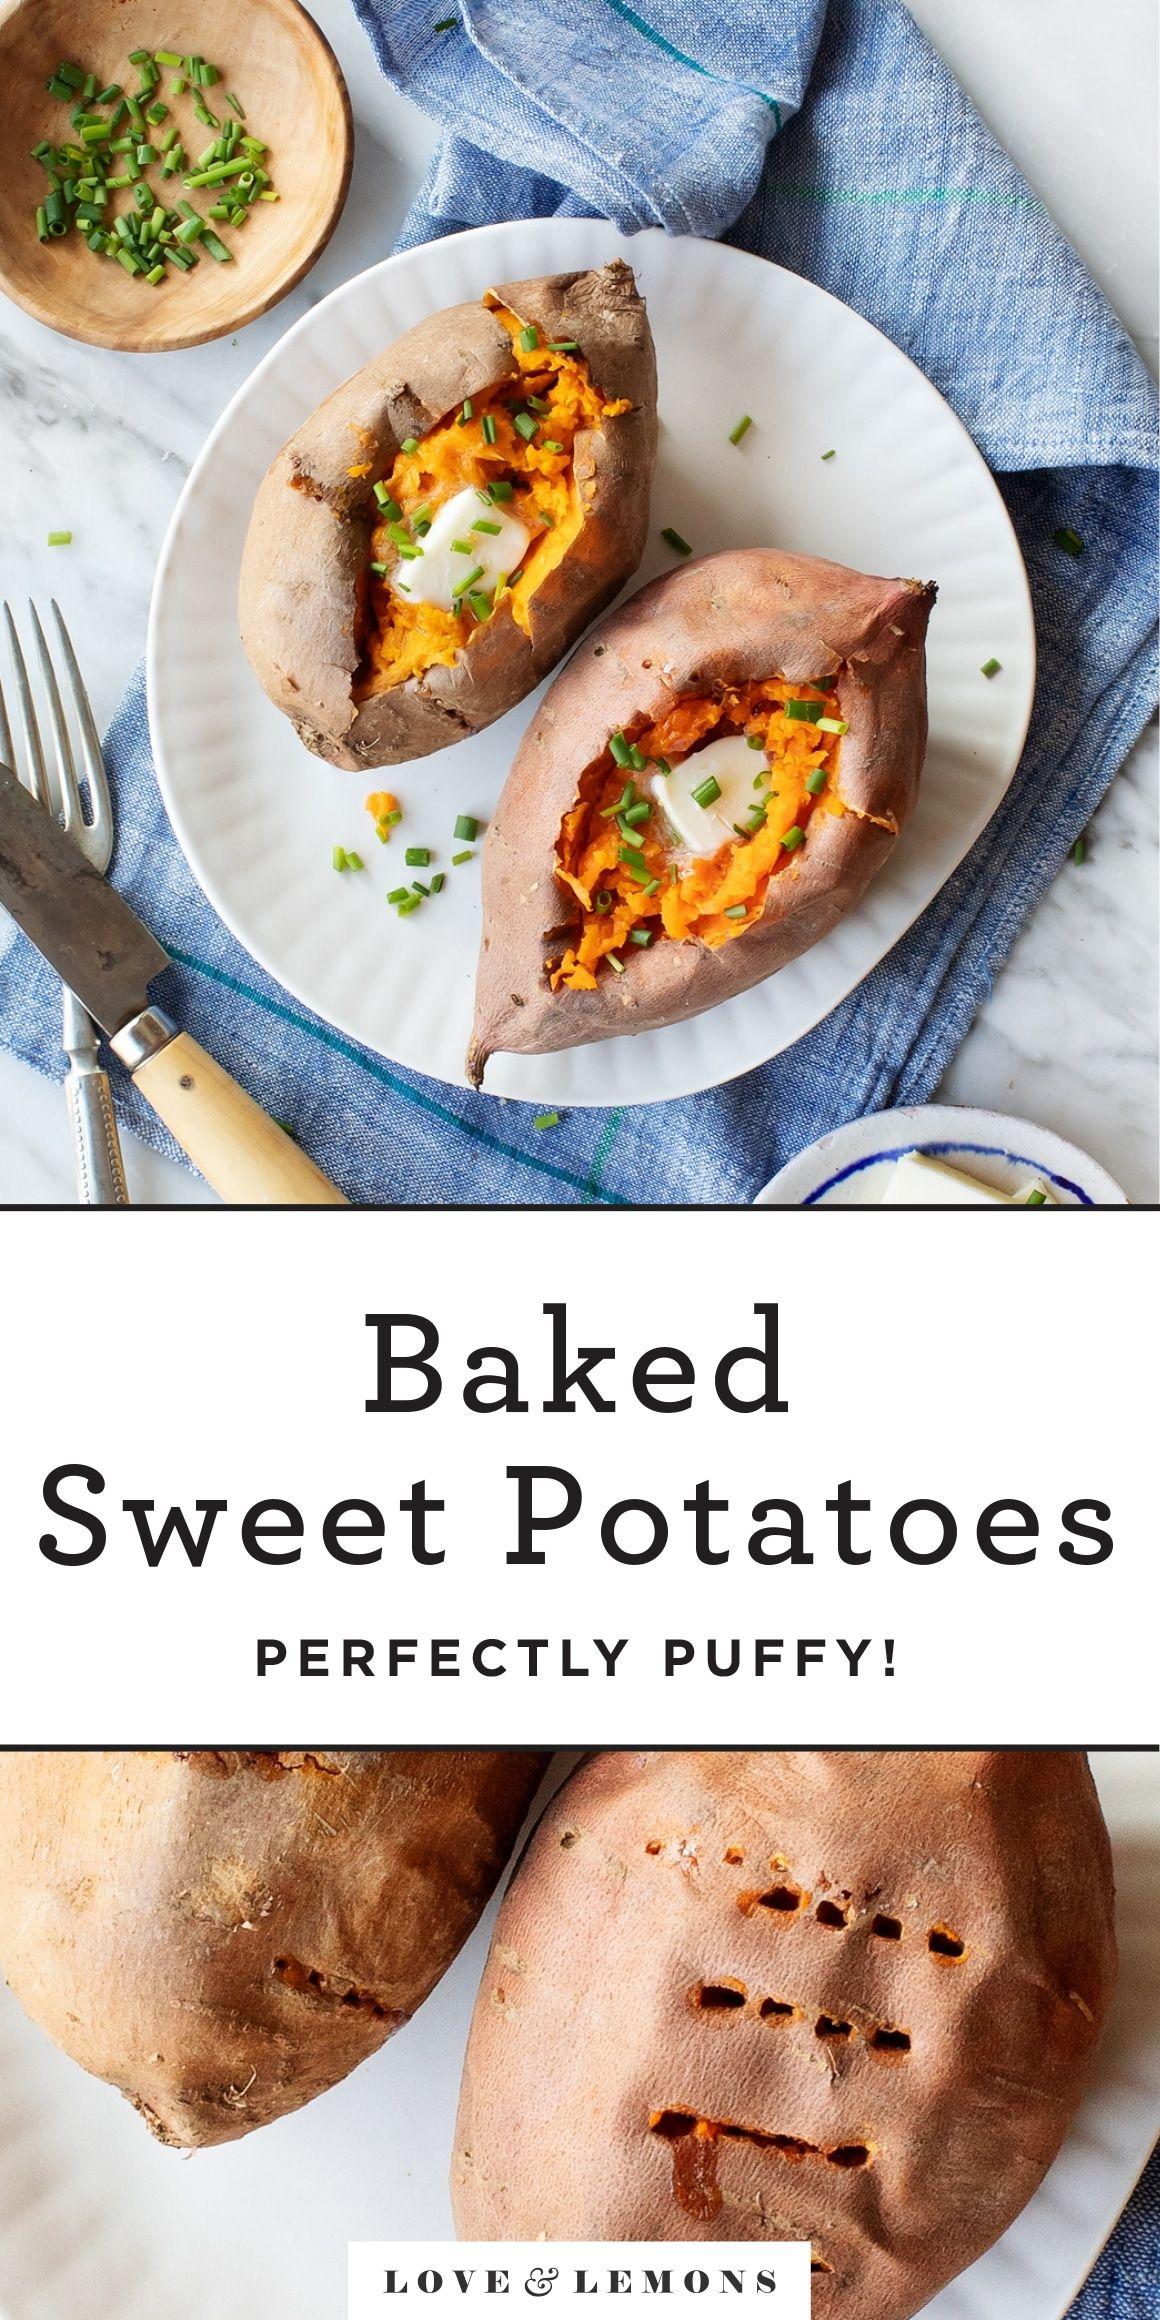 Baked Sweet Potato Recipes By Love And Lemons Recipe Sweet Potato Recipes Sweet Potato Dinner Potato Recipes